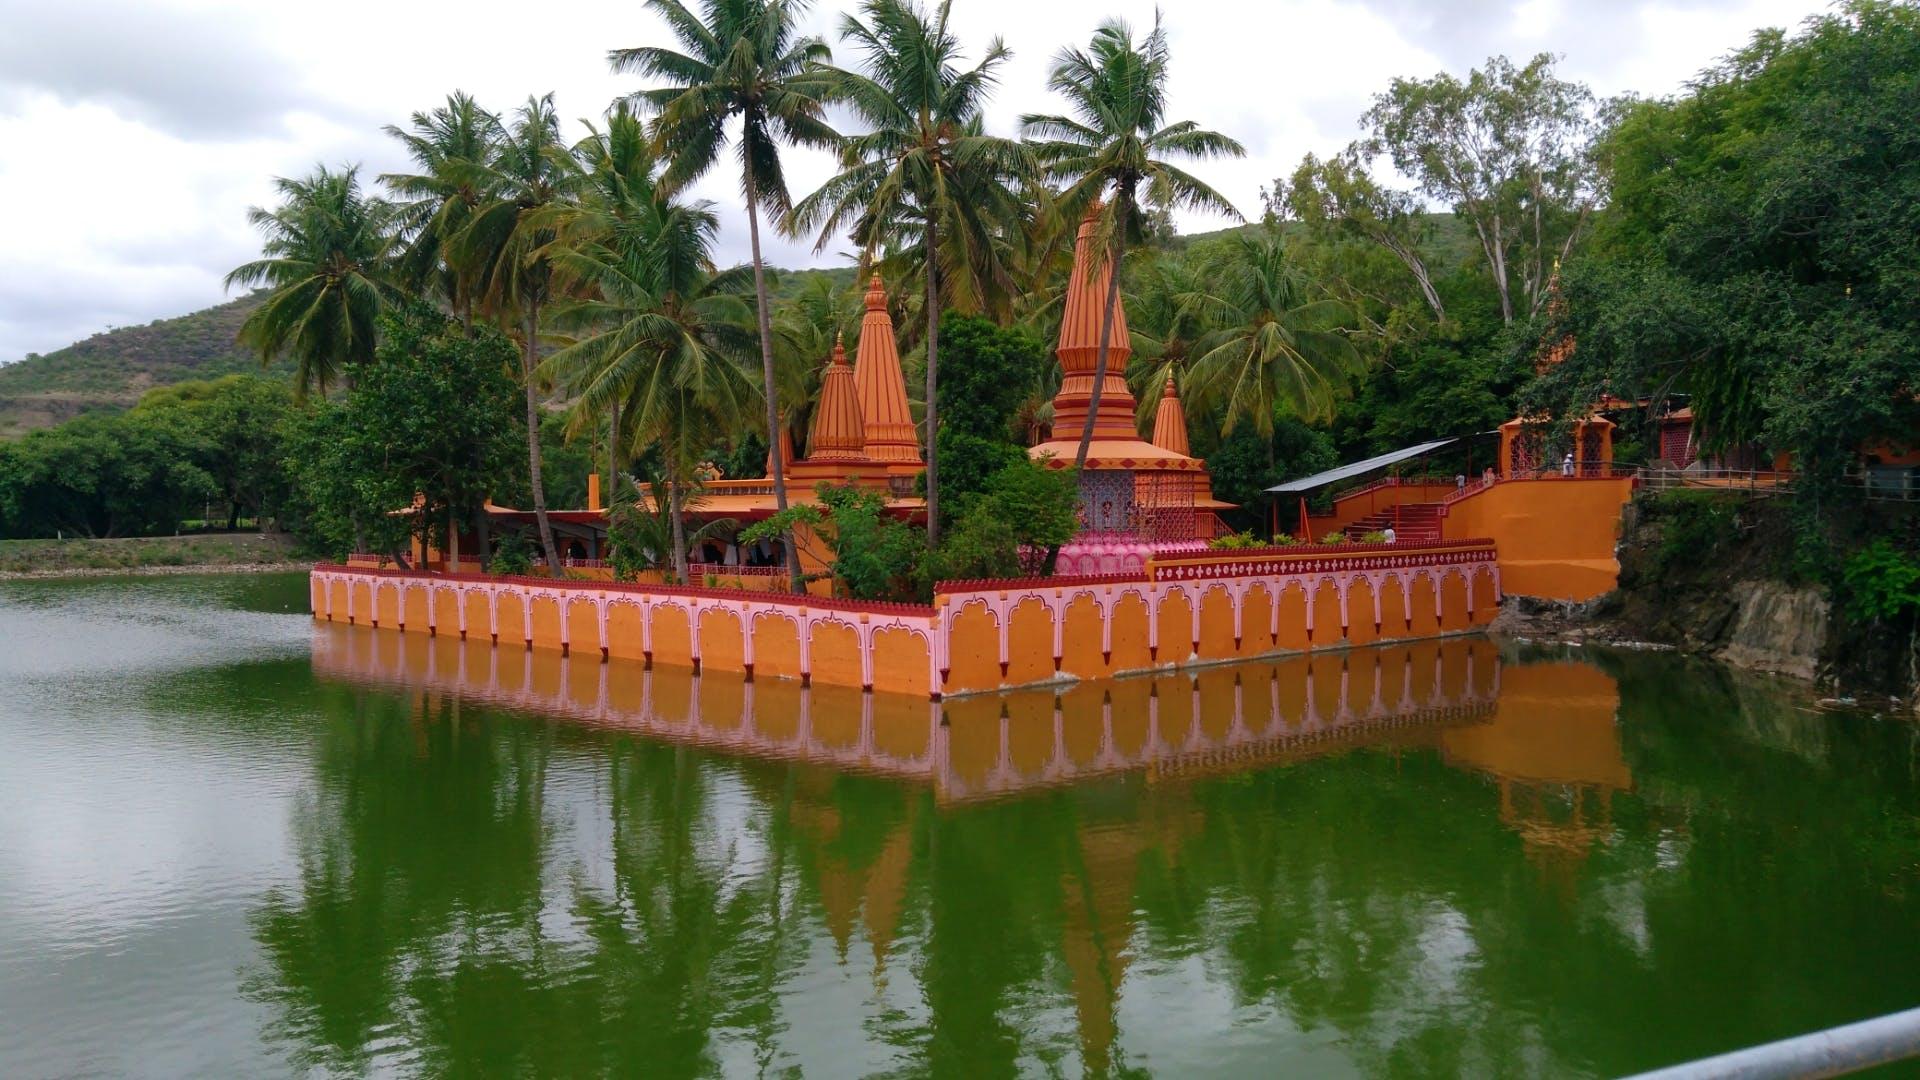 image - Ramdara Temple